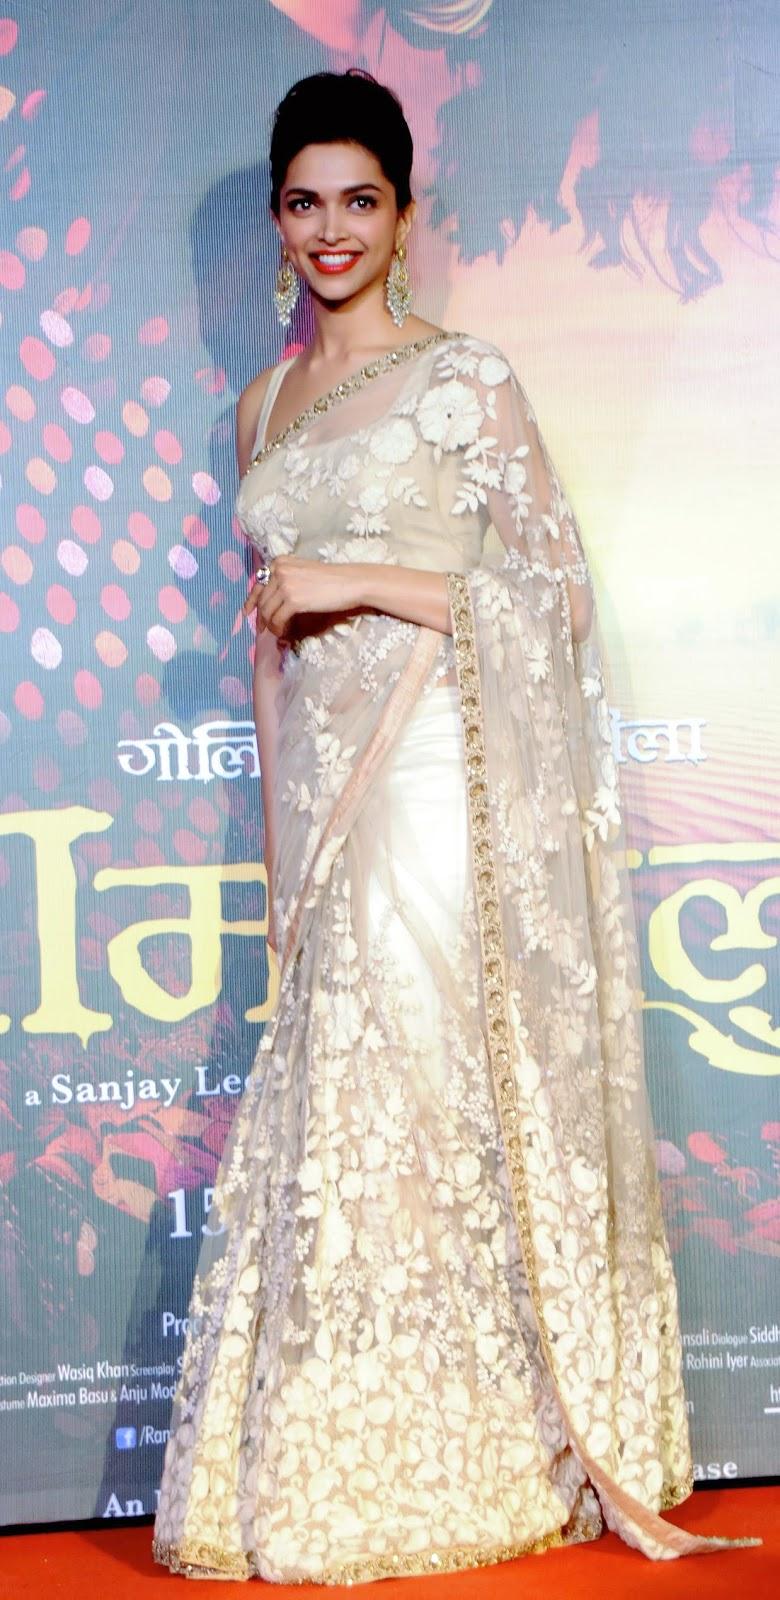 Bollywood, Bollywood actress, Deepika Padukone, Deepika Padukone and  Ranveer Singh, Deepika Photo, Entertainment, Film, Finding Fanny Fernandes, Movies, Ram Leela, Sanjay Leela Bhansali, Showbiz,